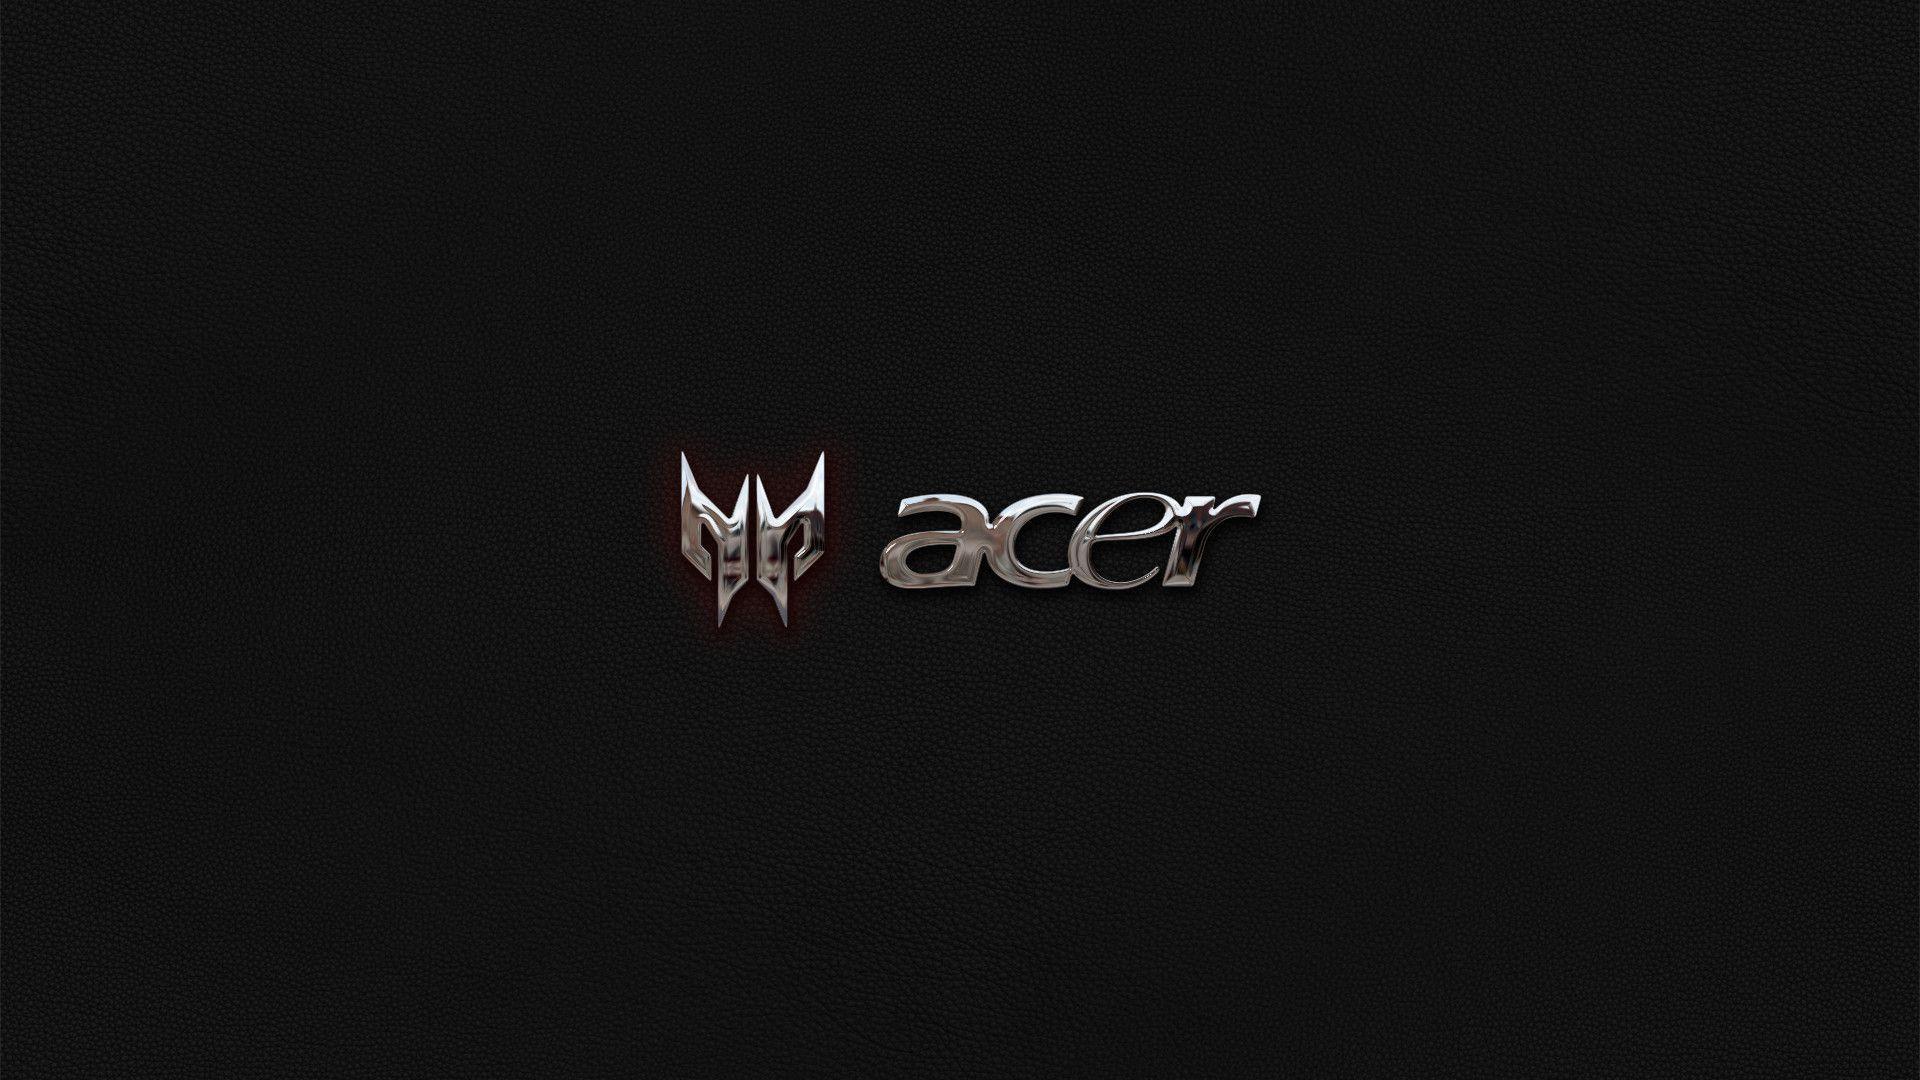 Acer Predator Wallpapers Top Free Acer Predator